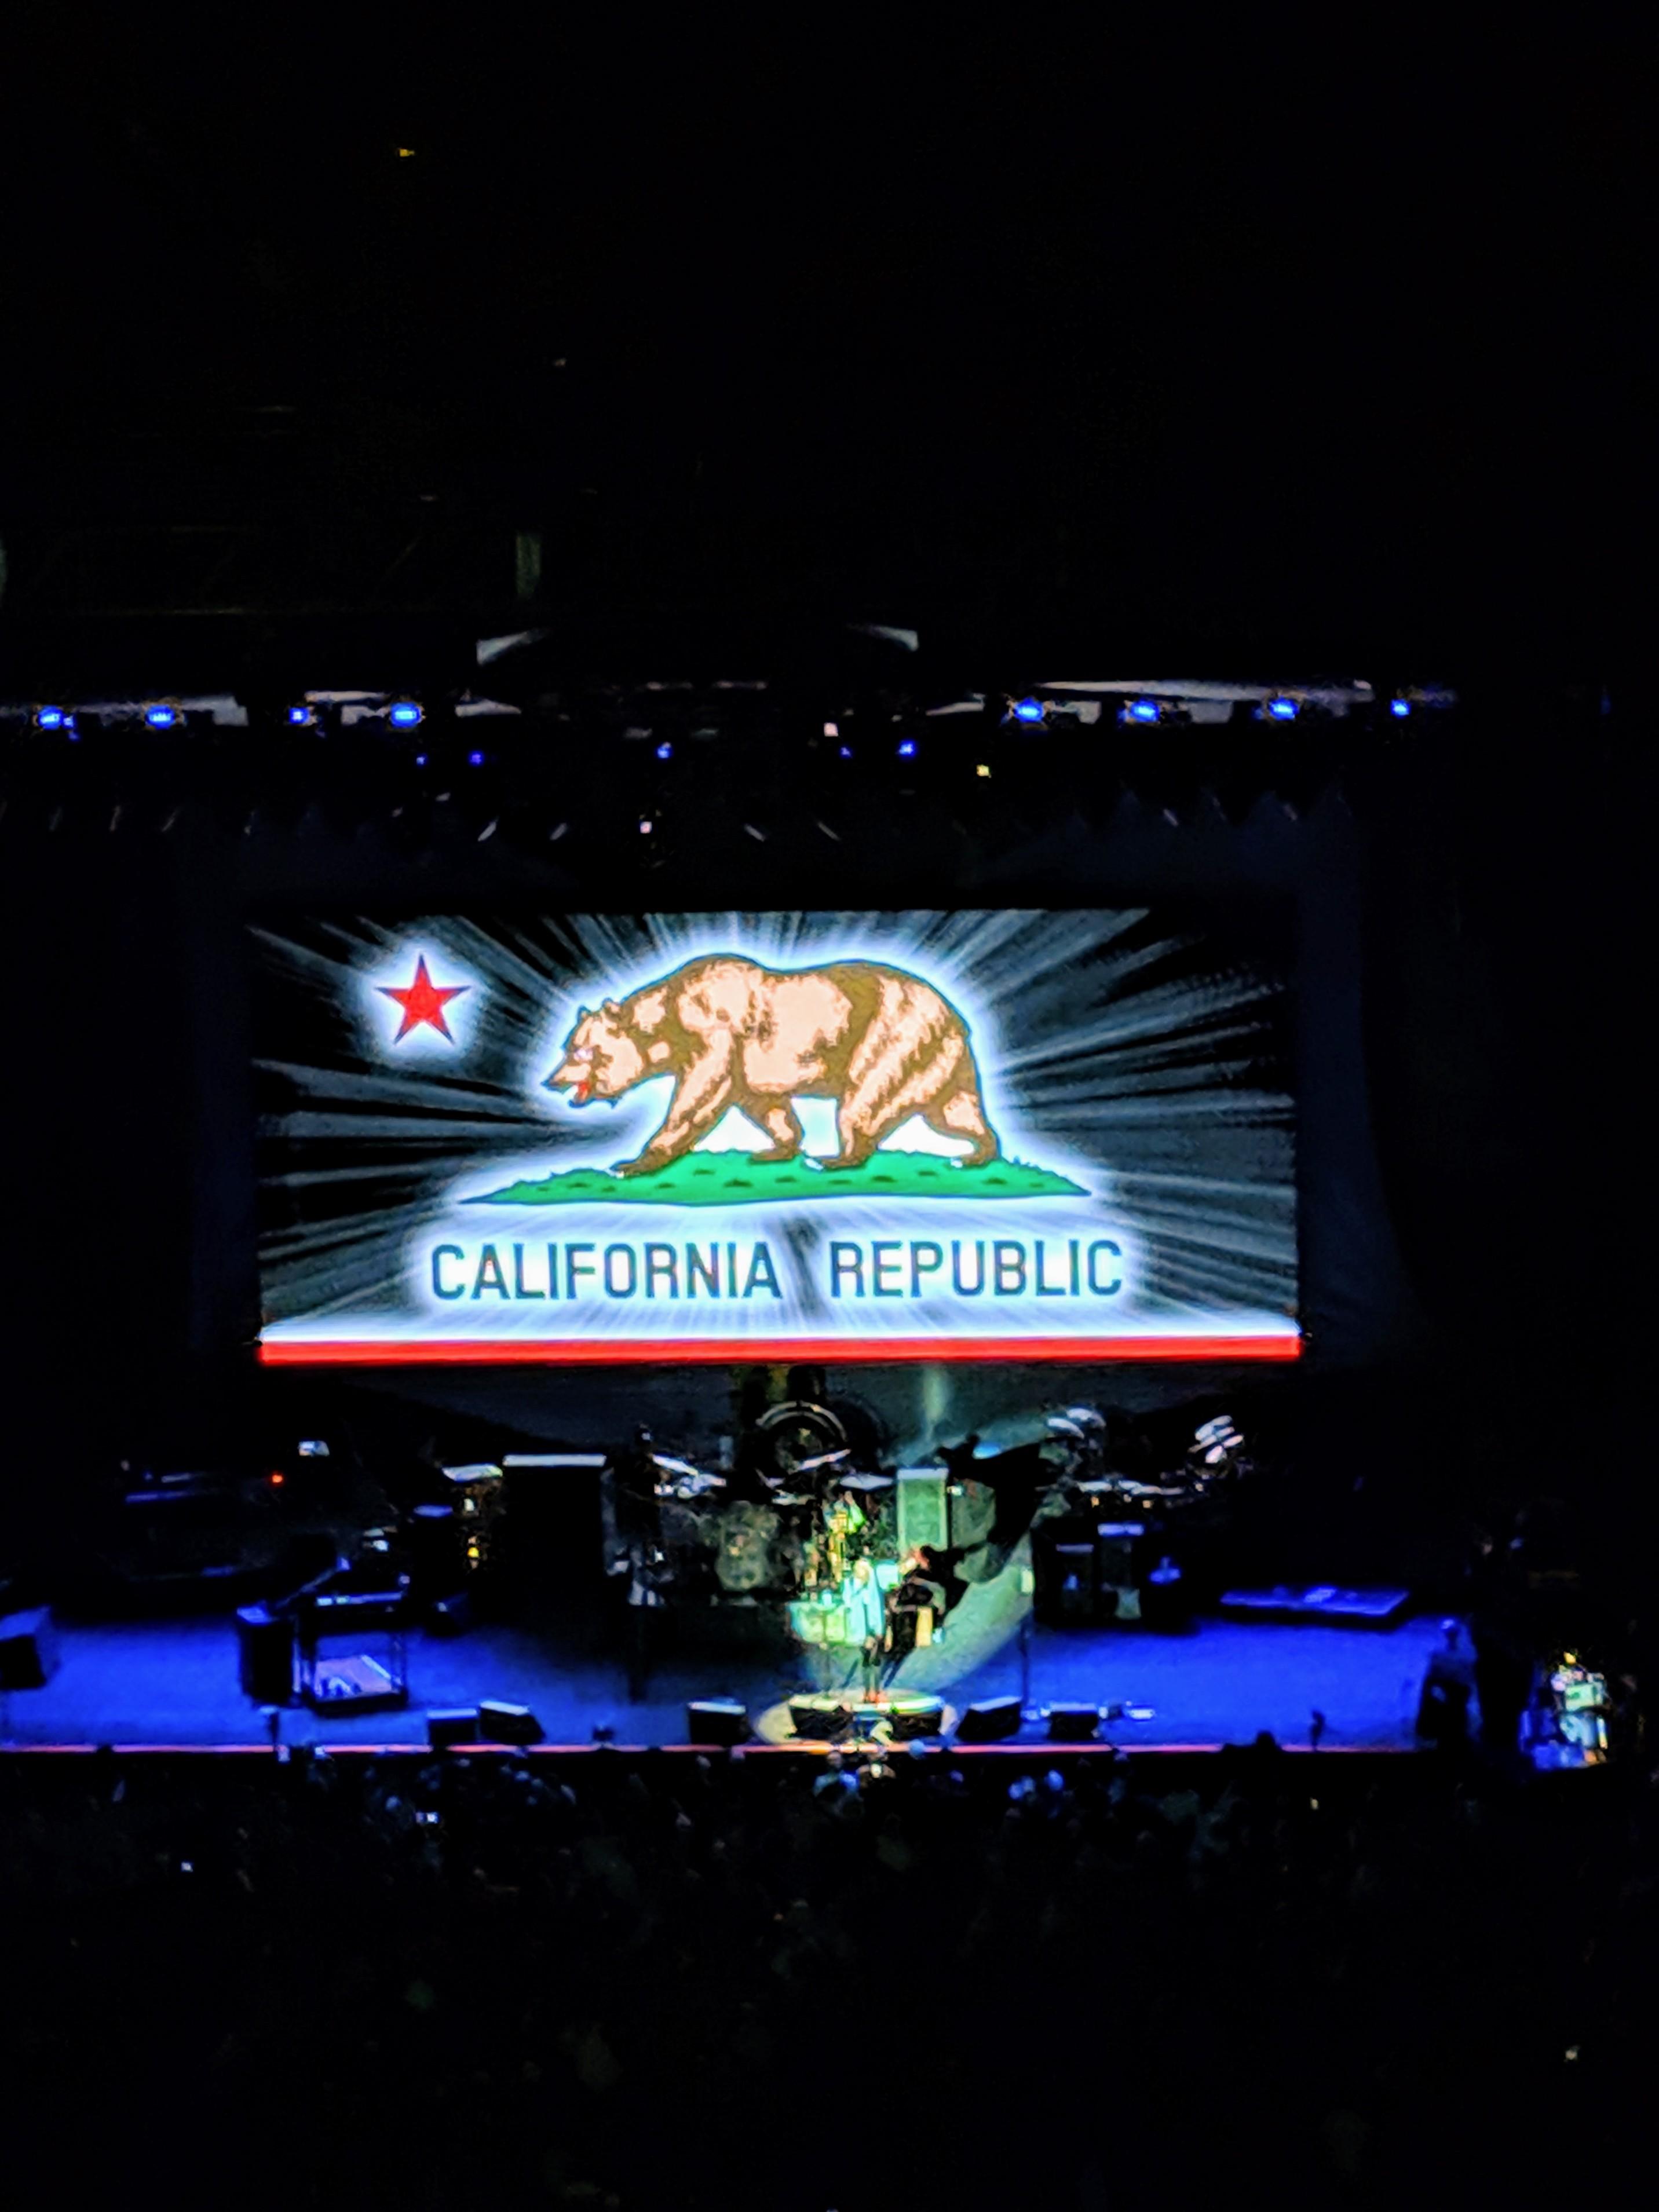 Concert Review: Fleetwood Mac, Oracle Arena, Oakland, 11/25/18